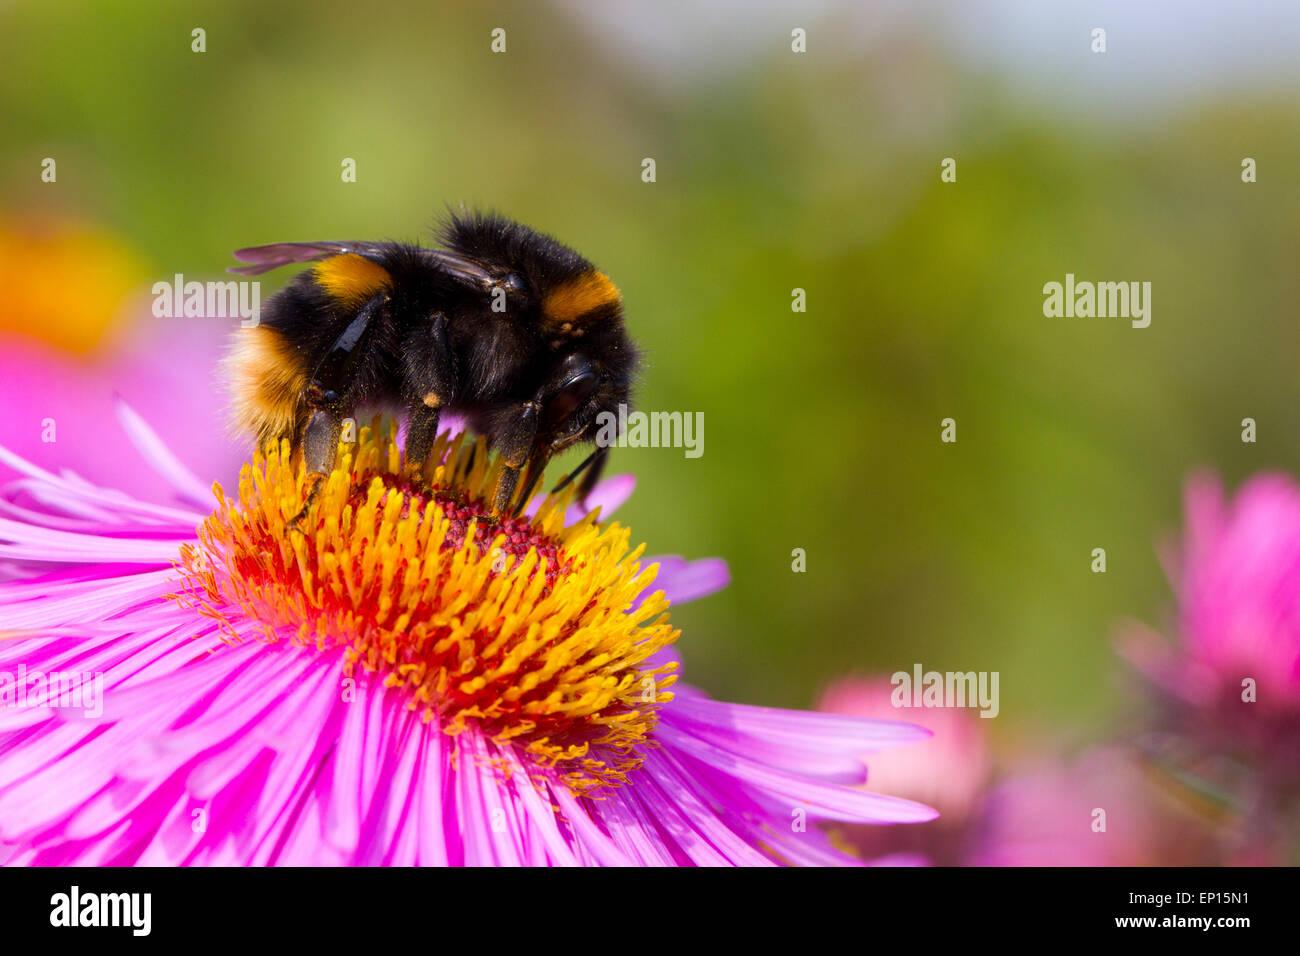 Buff-tailed Hummel (Bombus Terrestris) neue Königin Fütterung auf Michealmas Daisy (Aster SP.) Blumen Stockbild